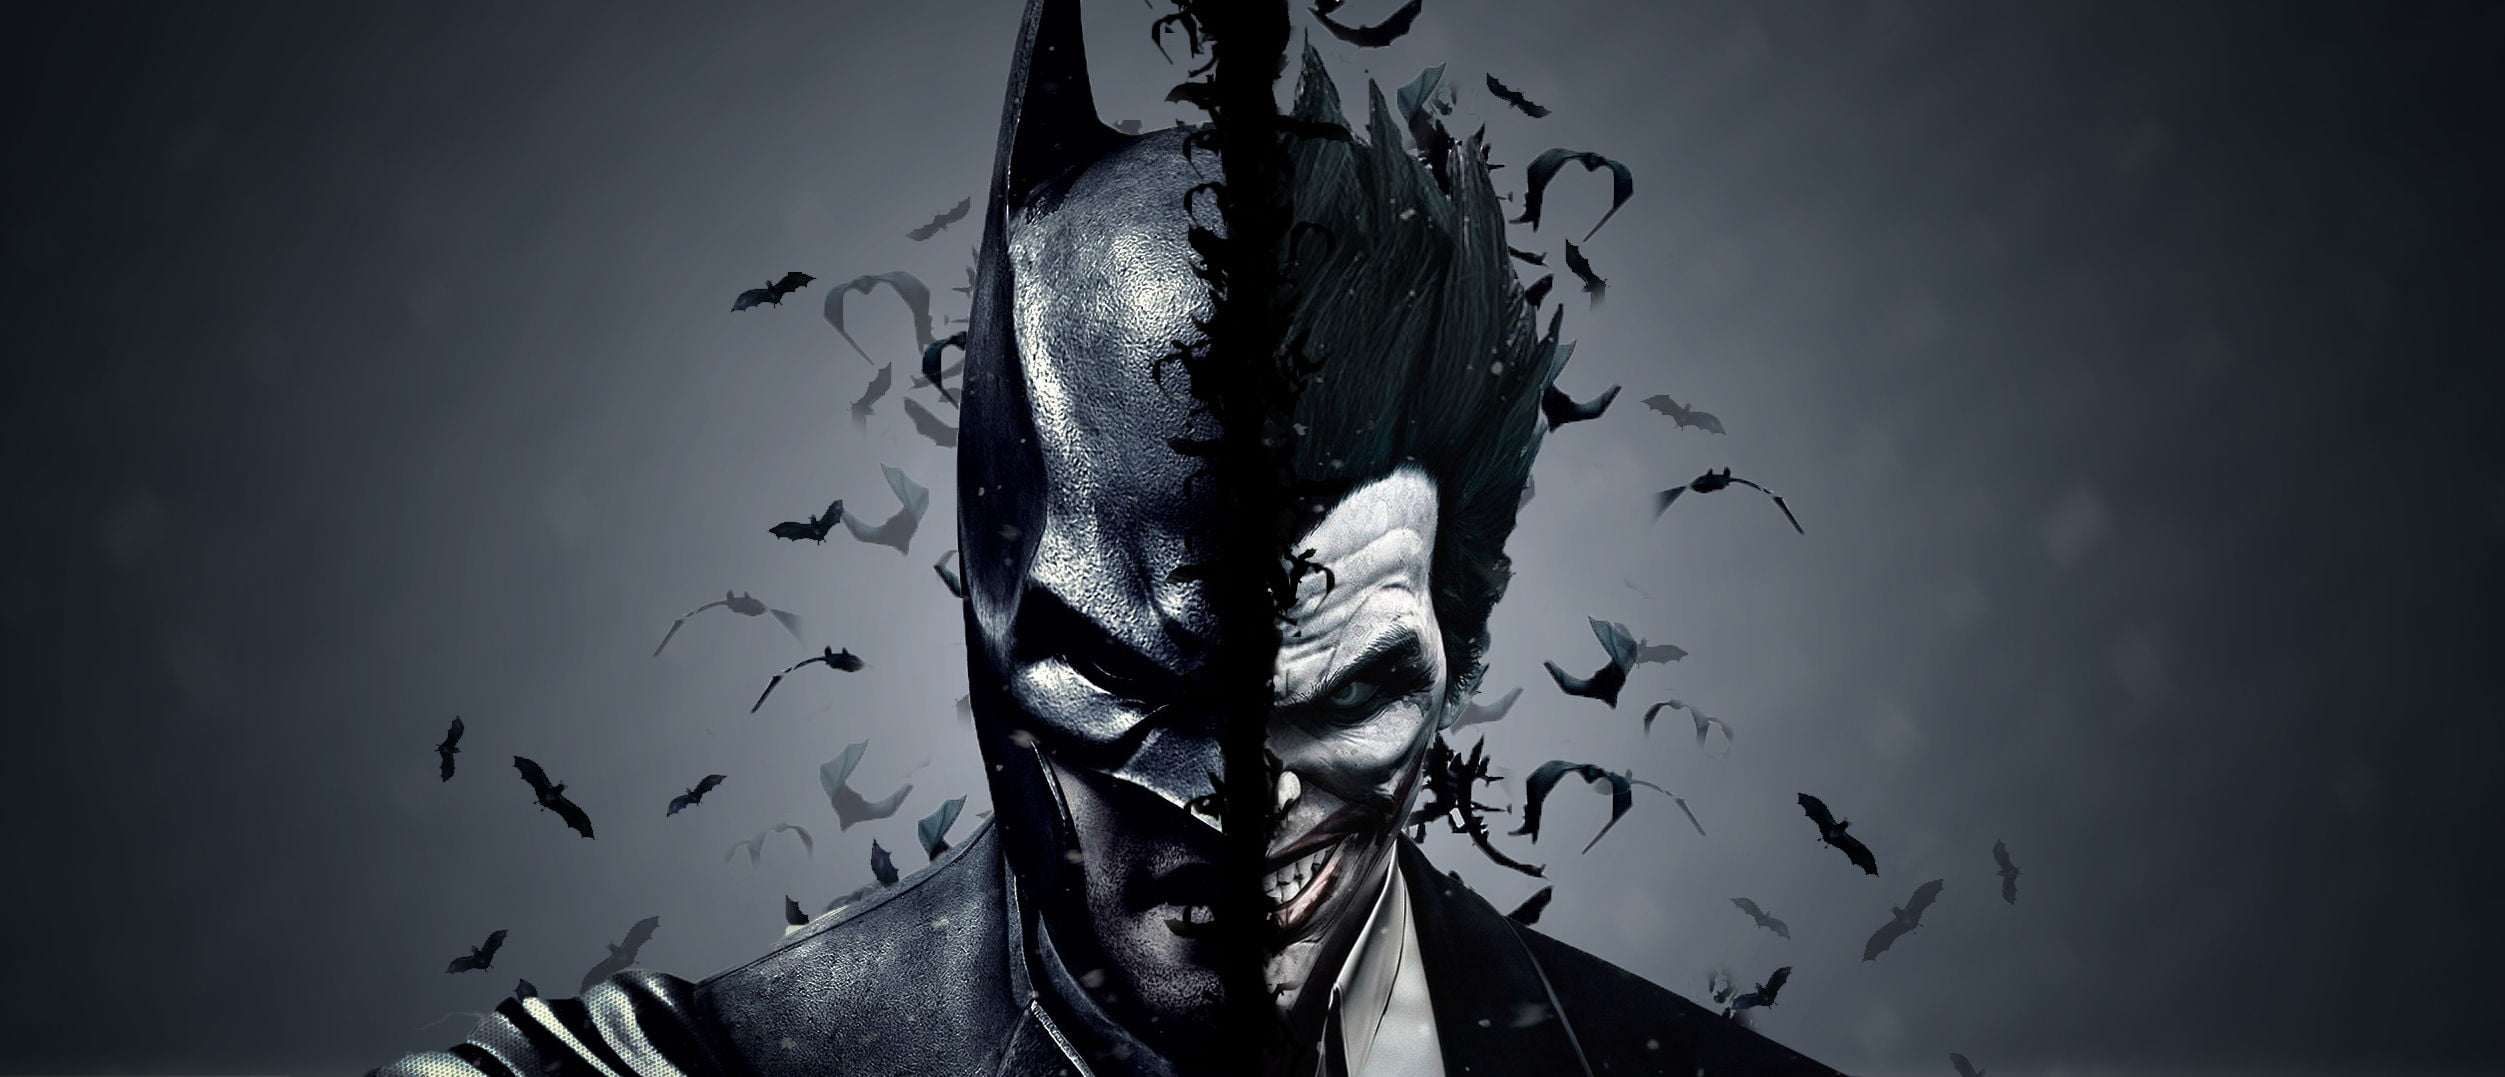 Black Wallpaper Iphone 7 Plus Batman And Joker Wallpaper Hd Wallpaper Wallpaper Flare